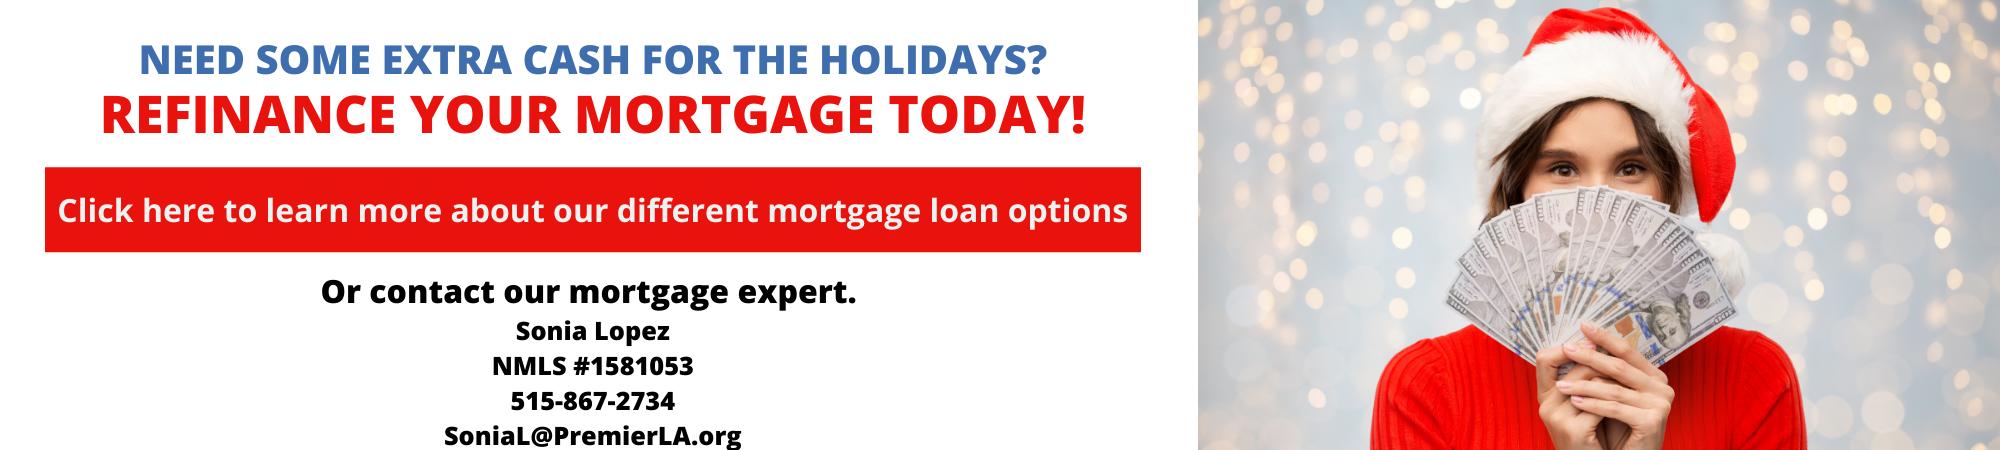 Mortgage Holiday